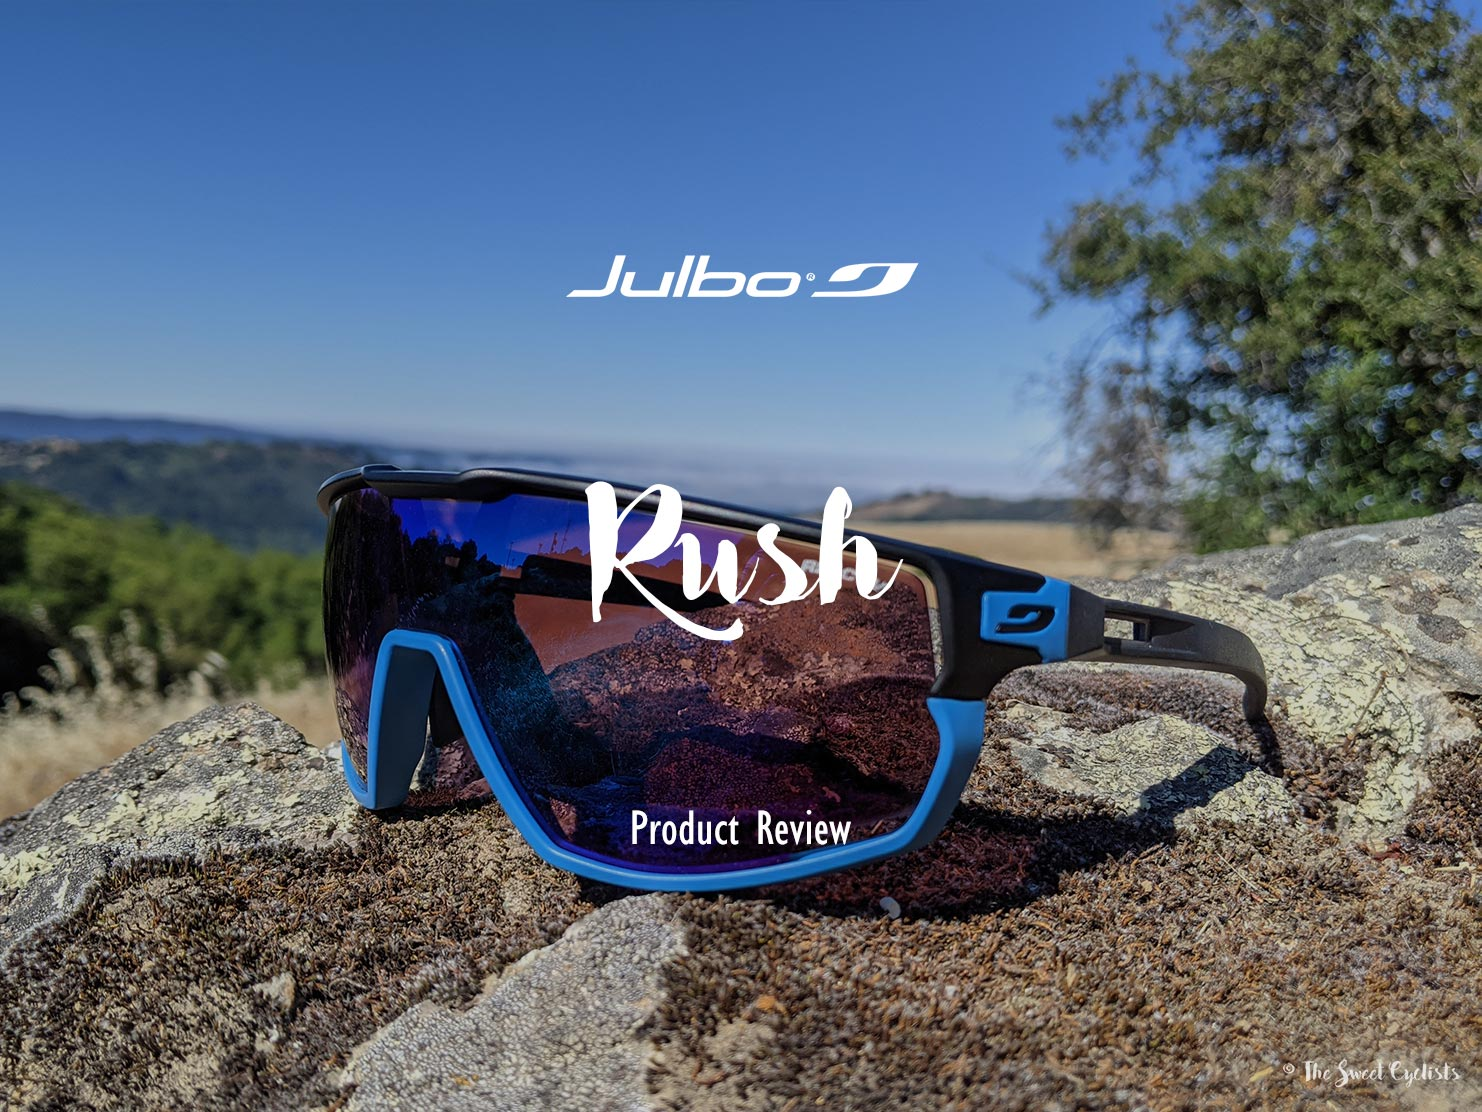 Julbo's oversized and reactive sunglasses